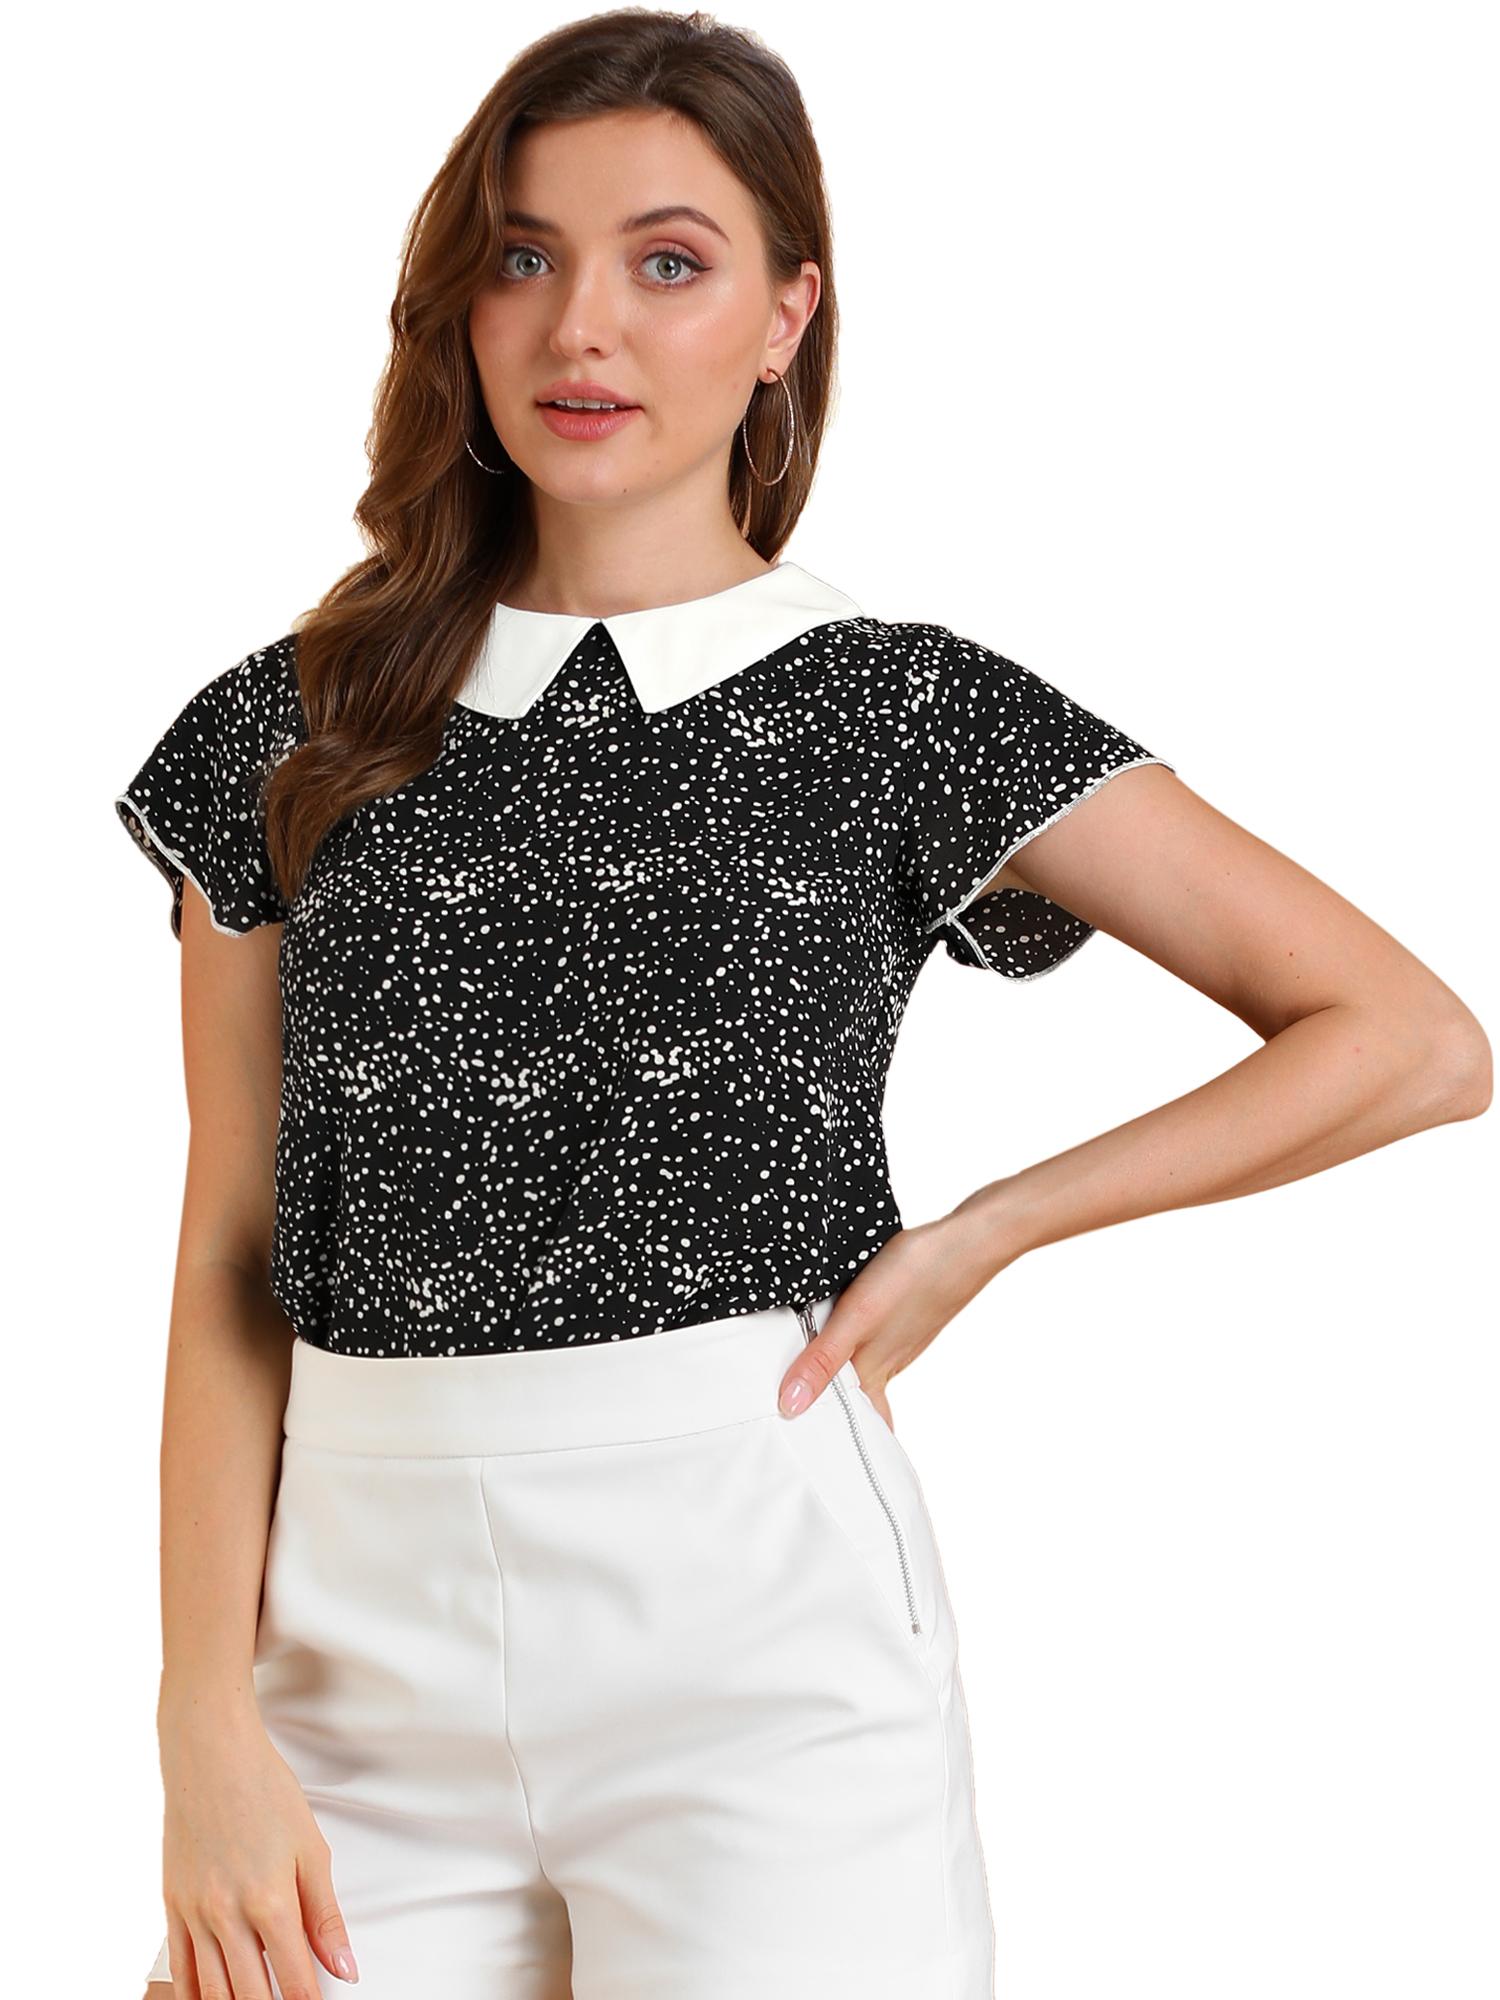 Allegra K Women's Irregular Polka Dots Contrast Collar Blouse Black M